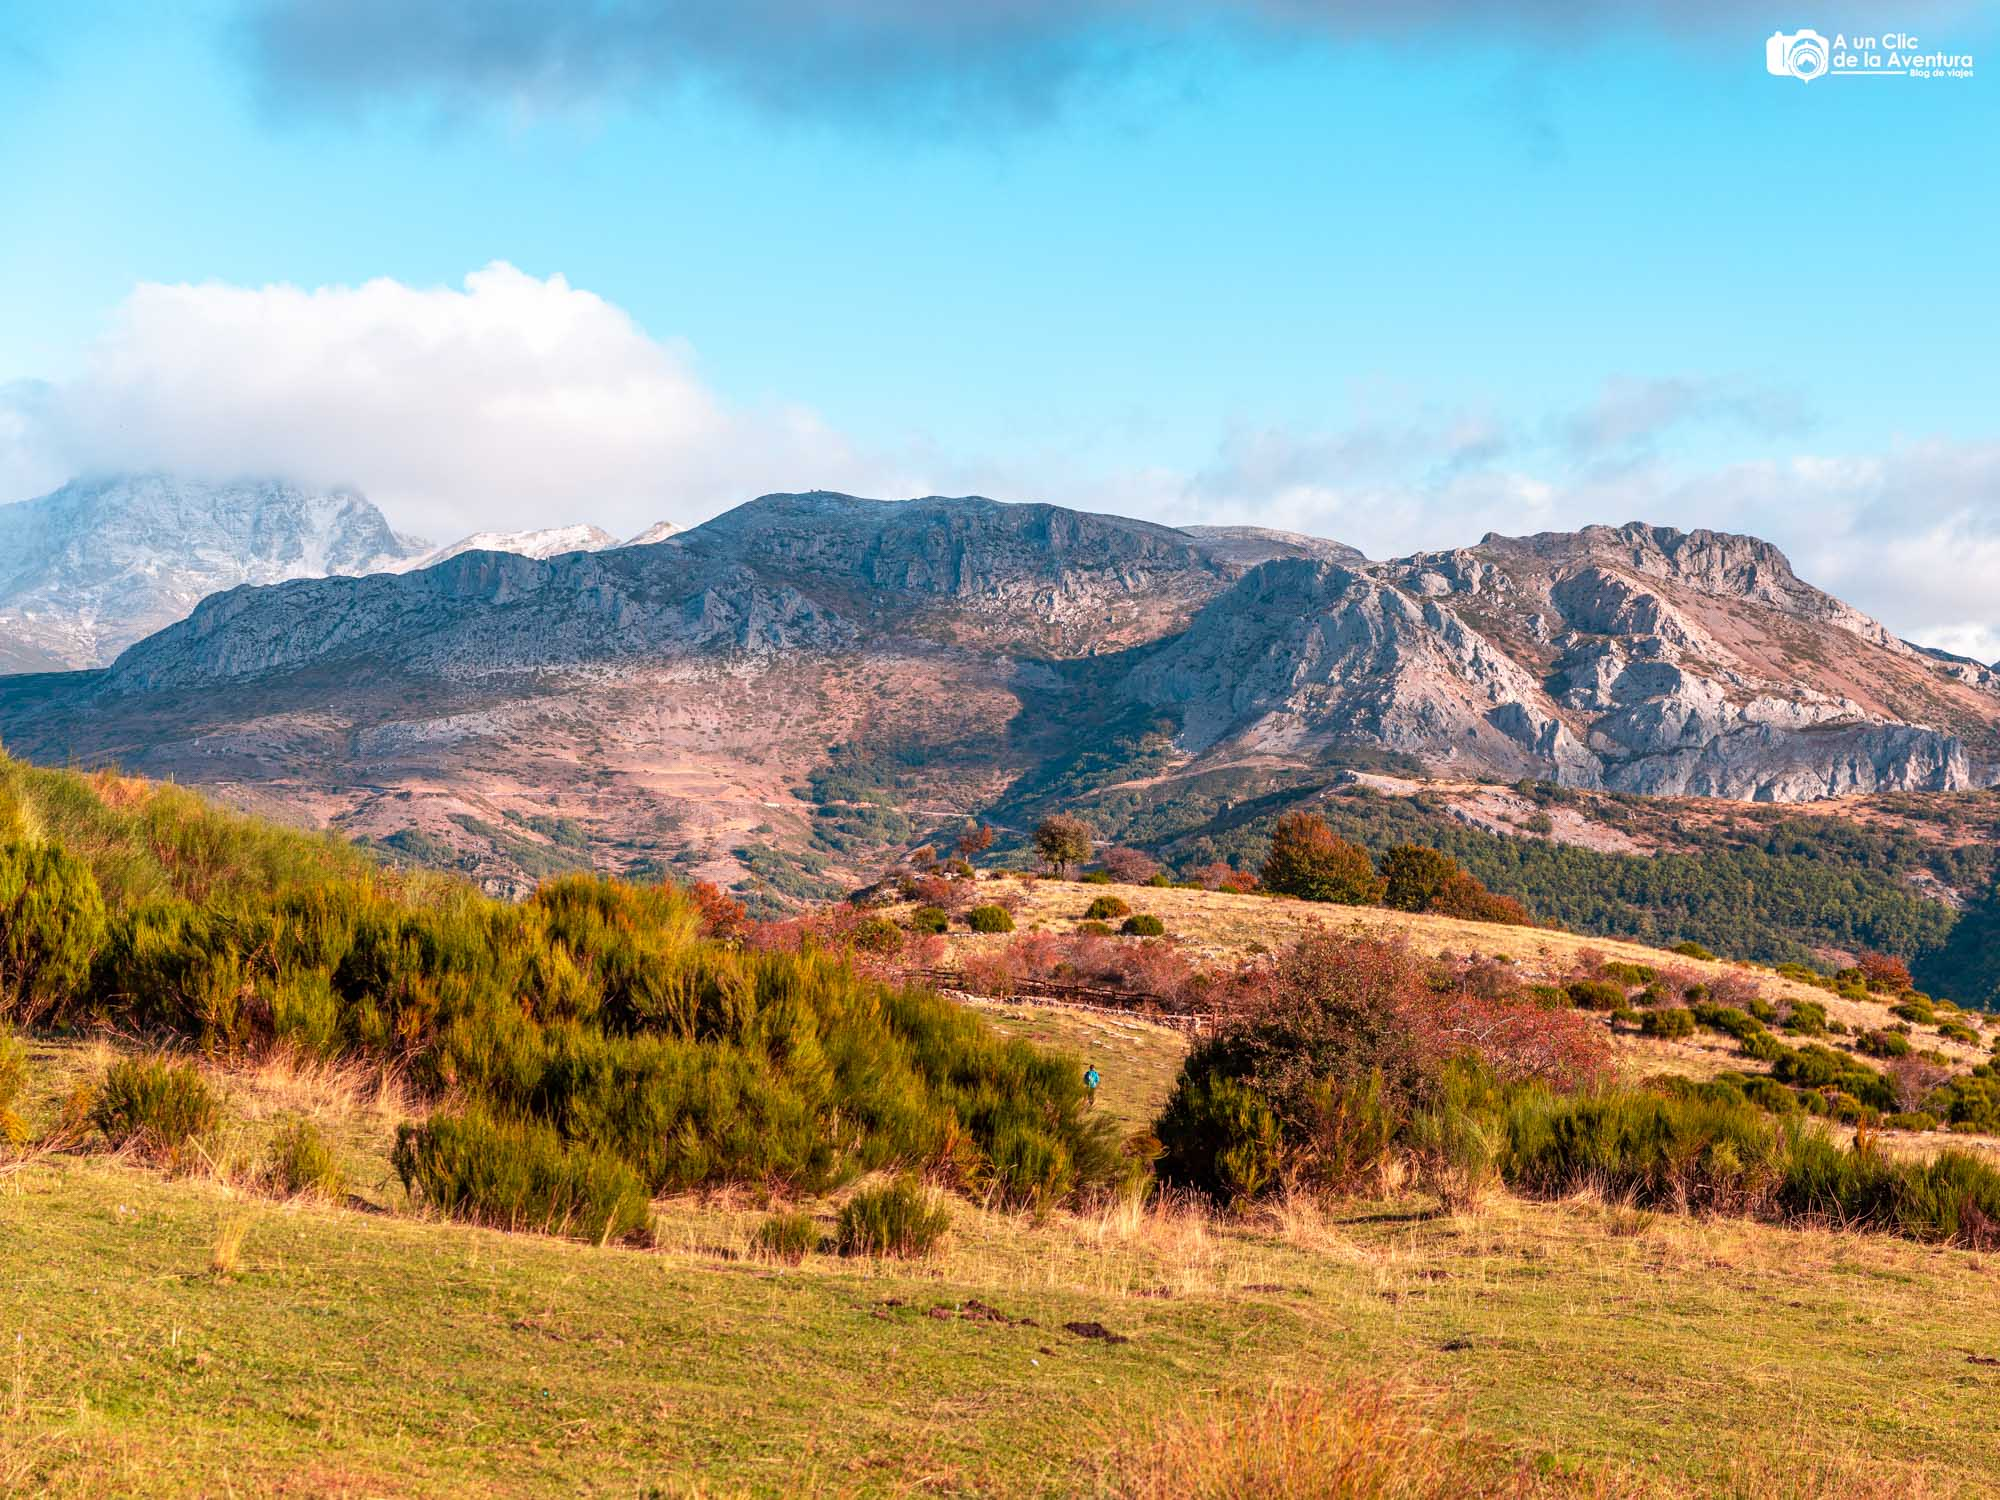 Cumbres de la Montaña Palentina